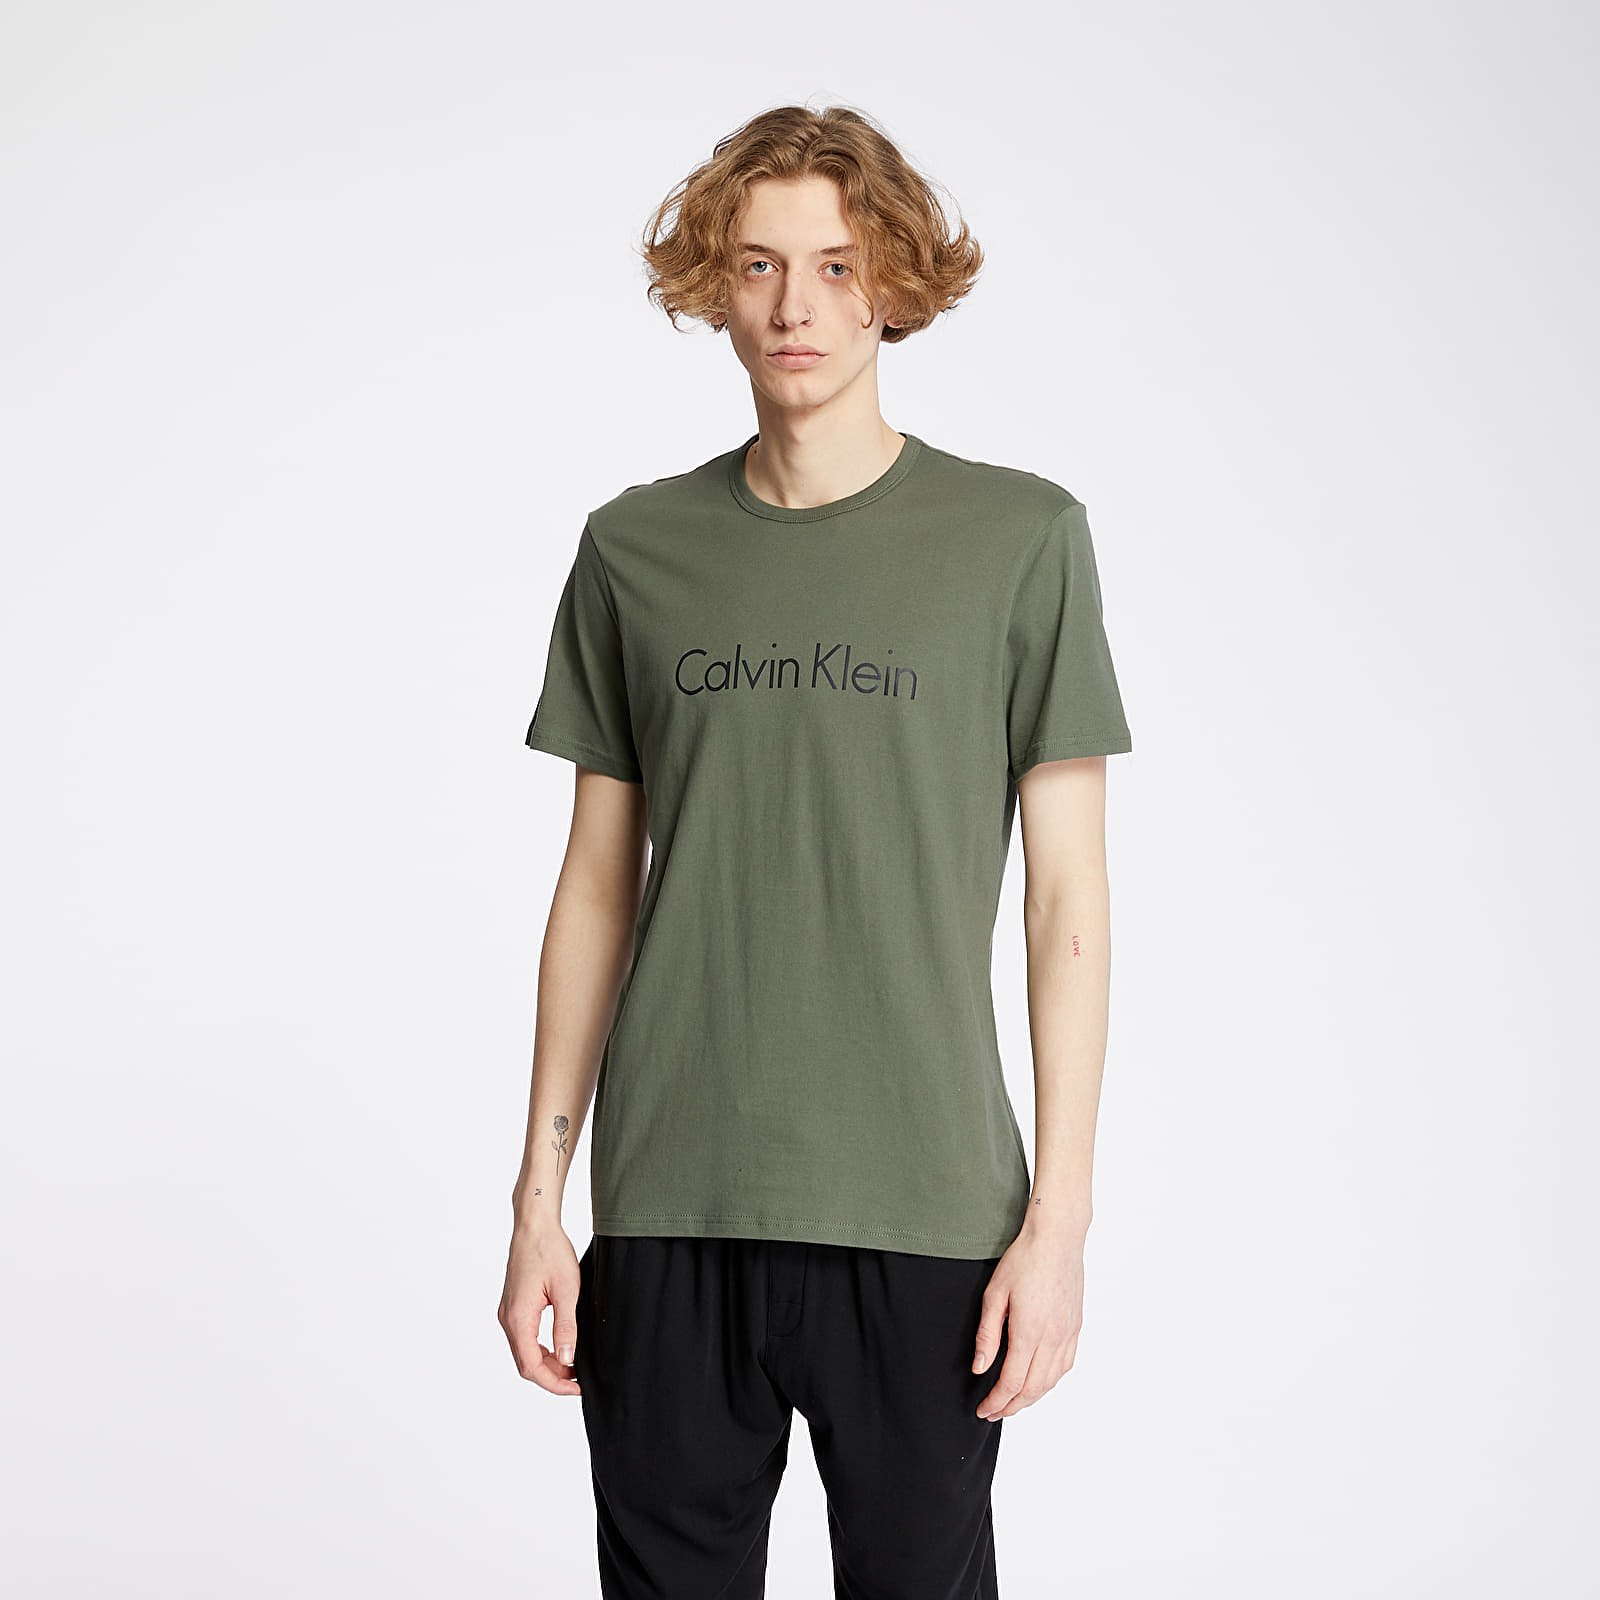 Calvin Klein Comfort Cotton Tee